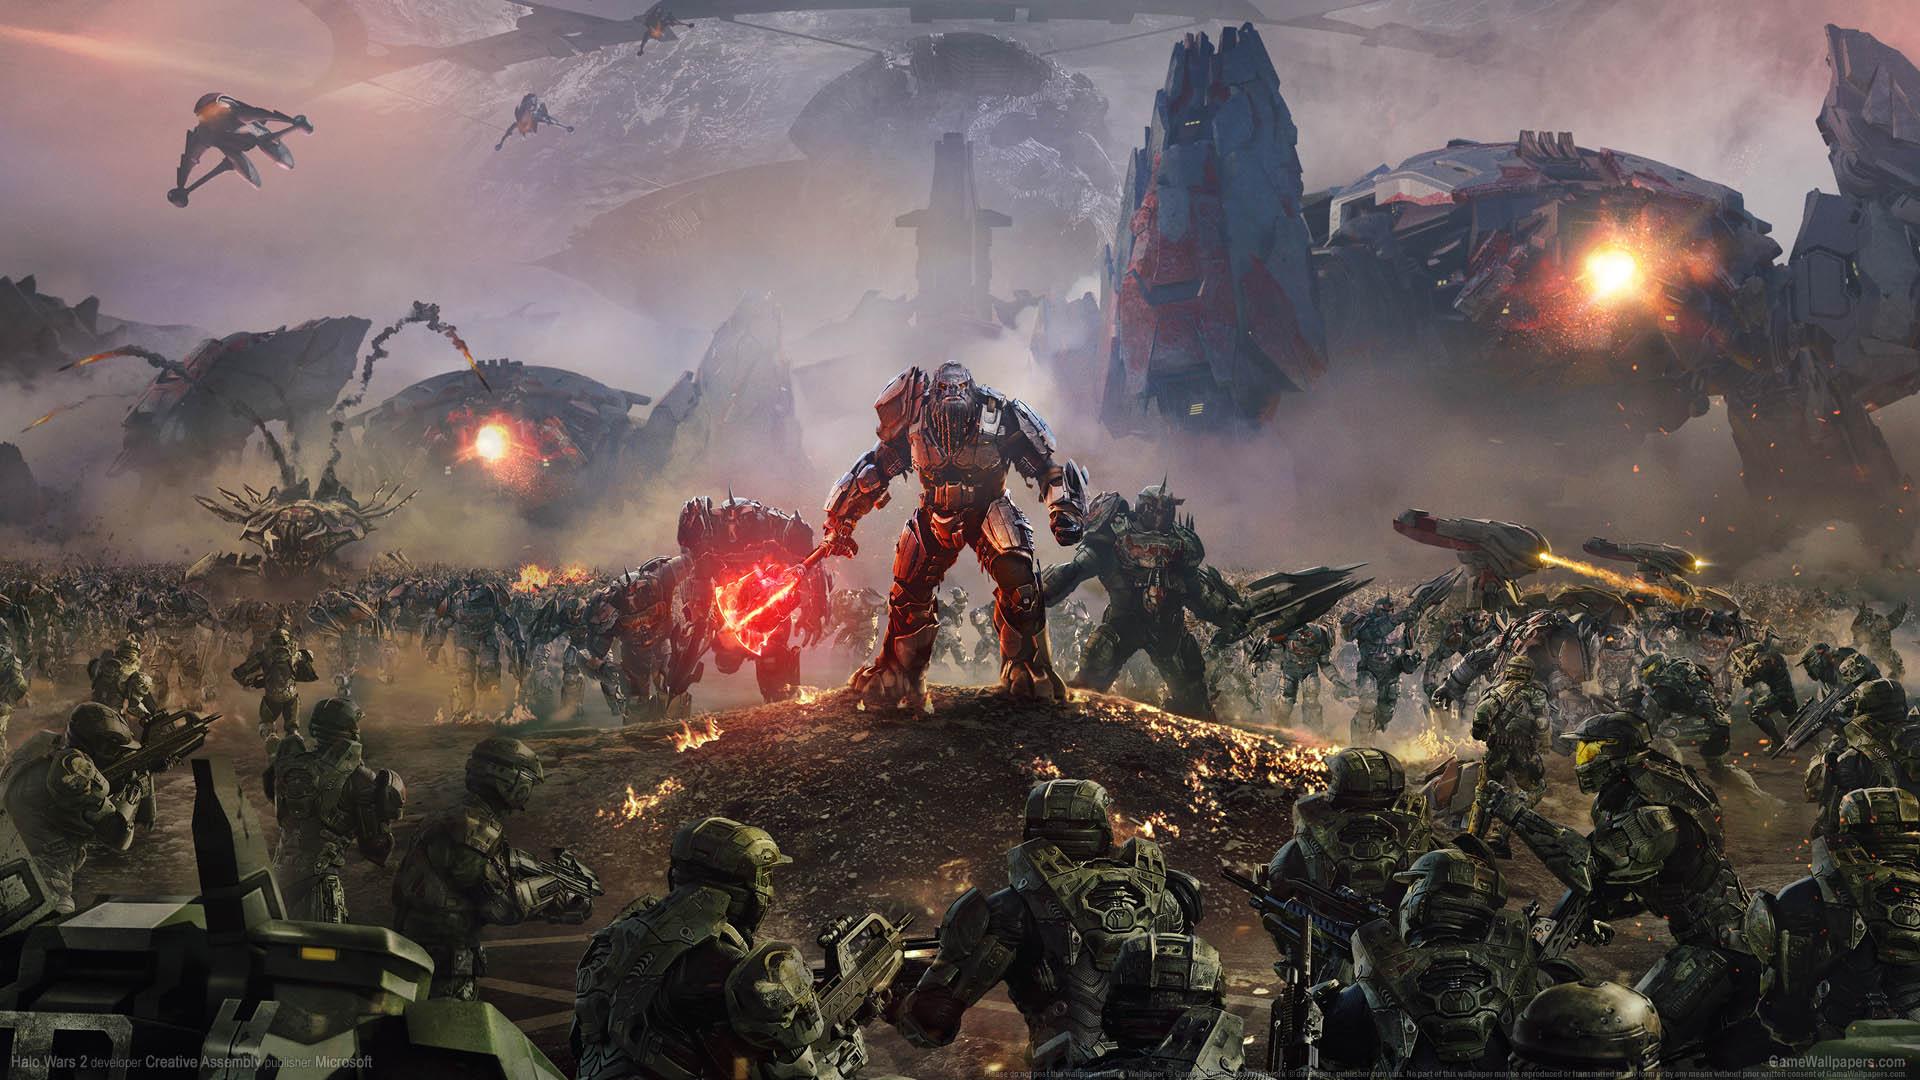 Halo Wars 2 wallpaper 01 1920x1080